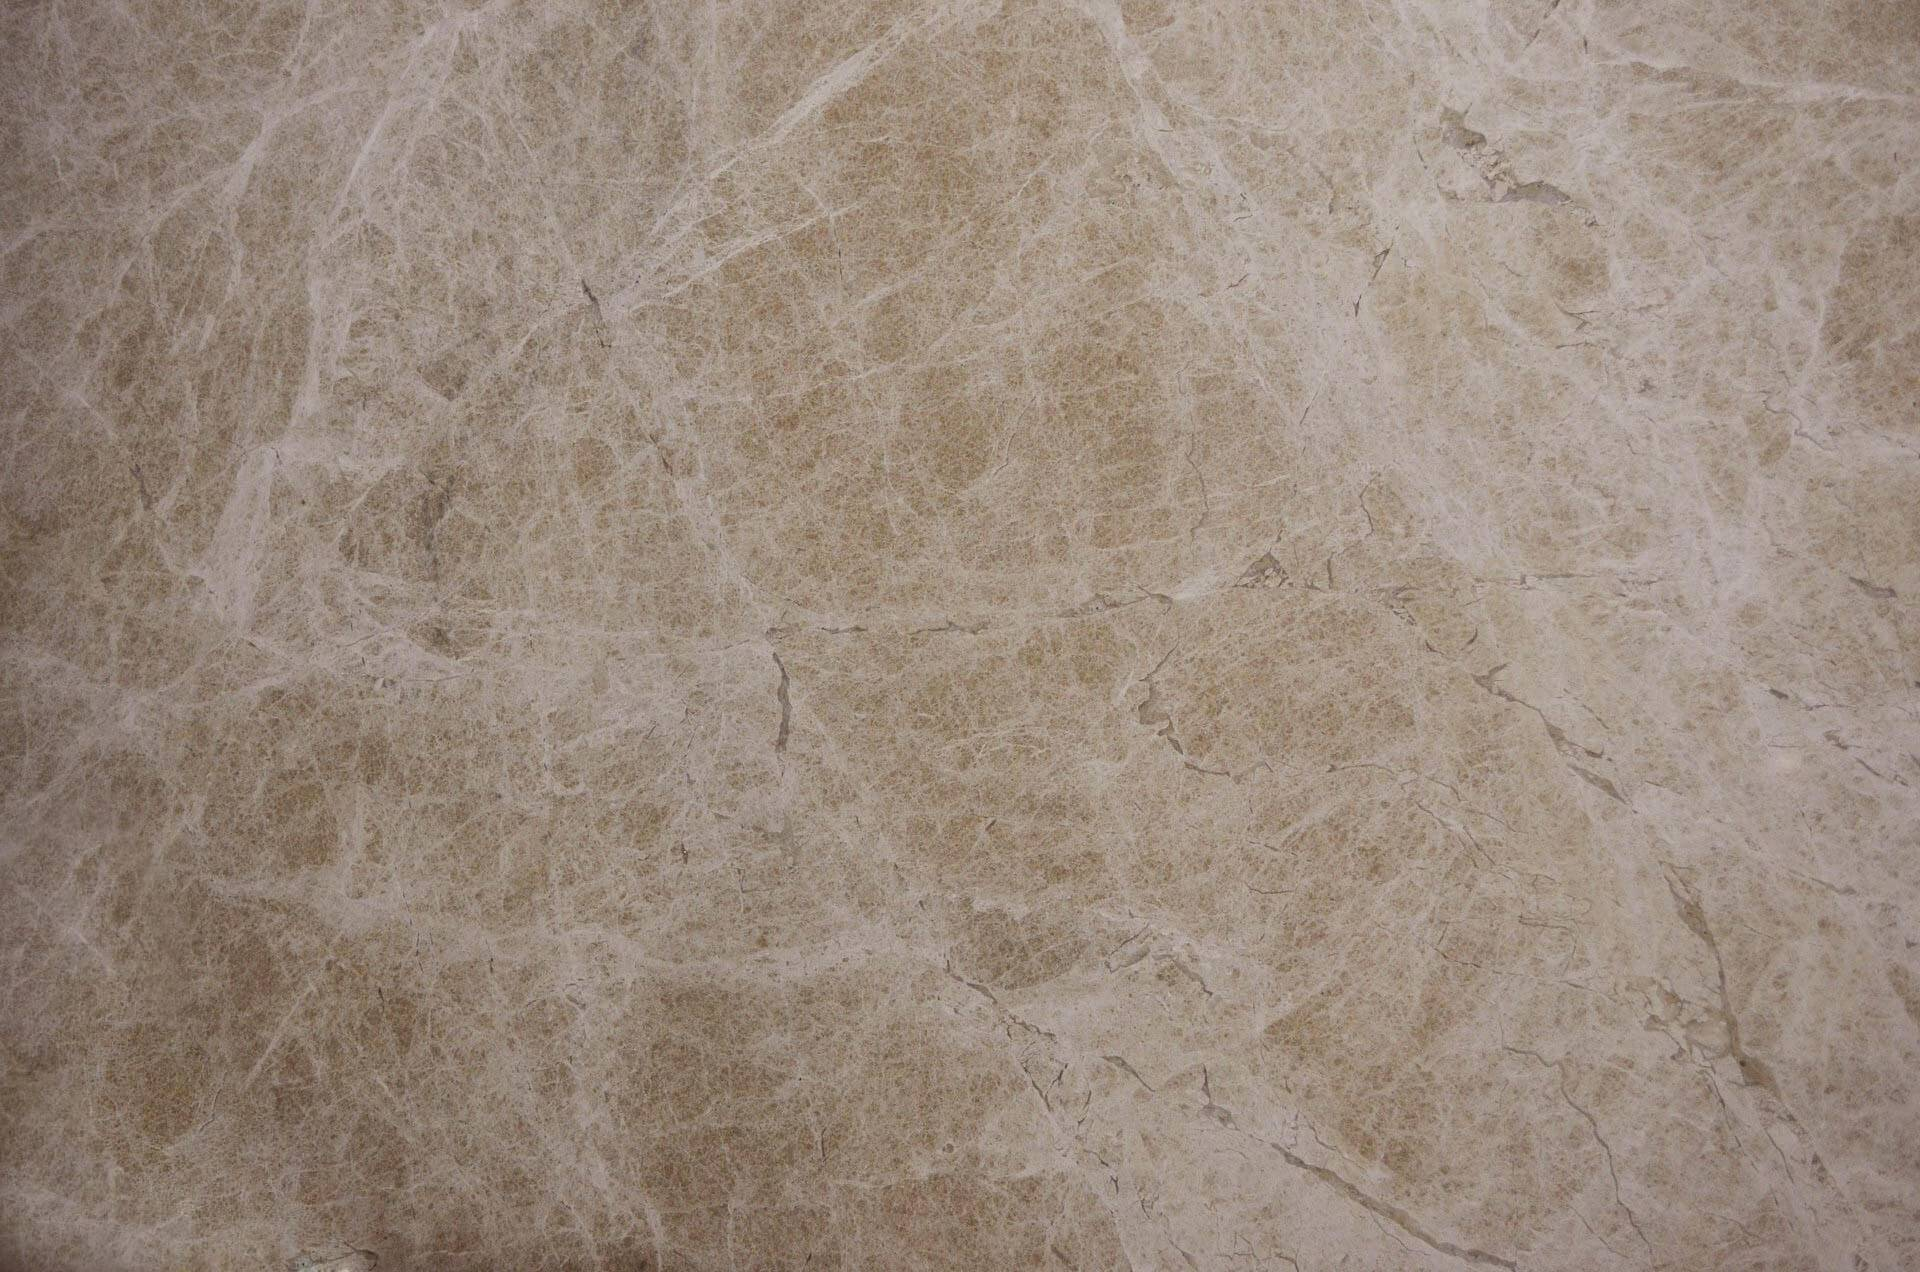 Pattara Beige фото 1 — камень от Bevers Marmyr